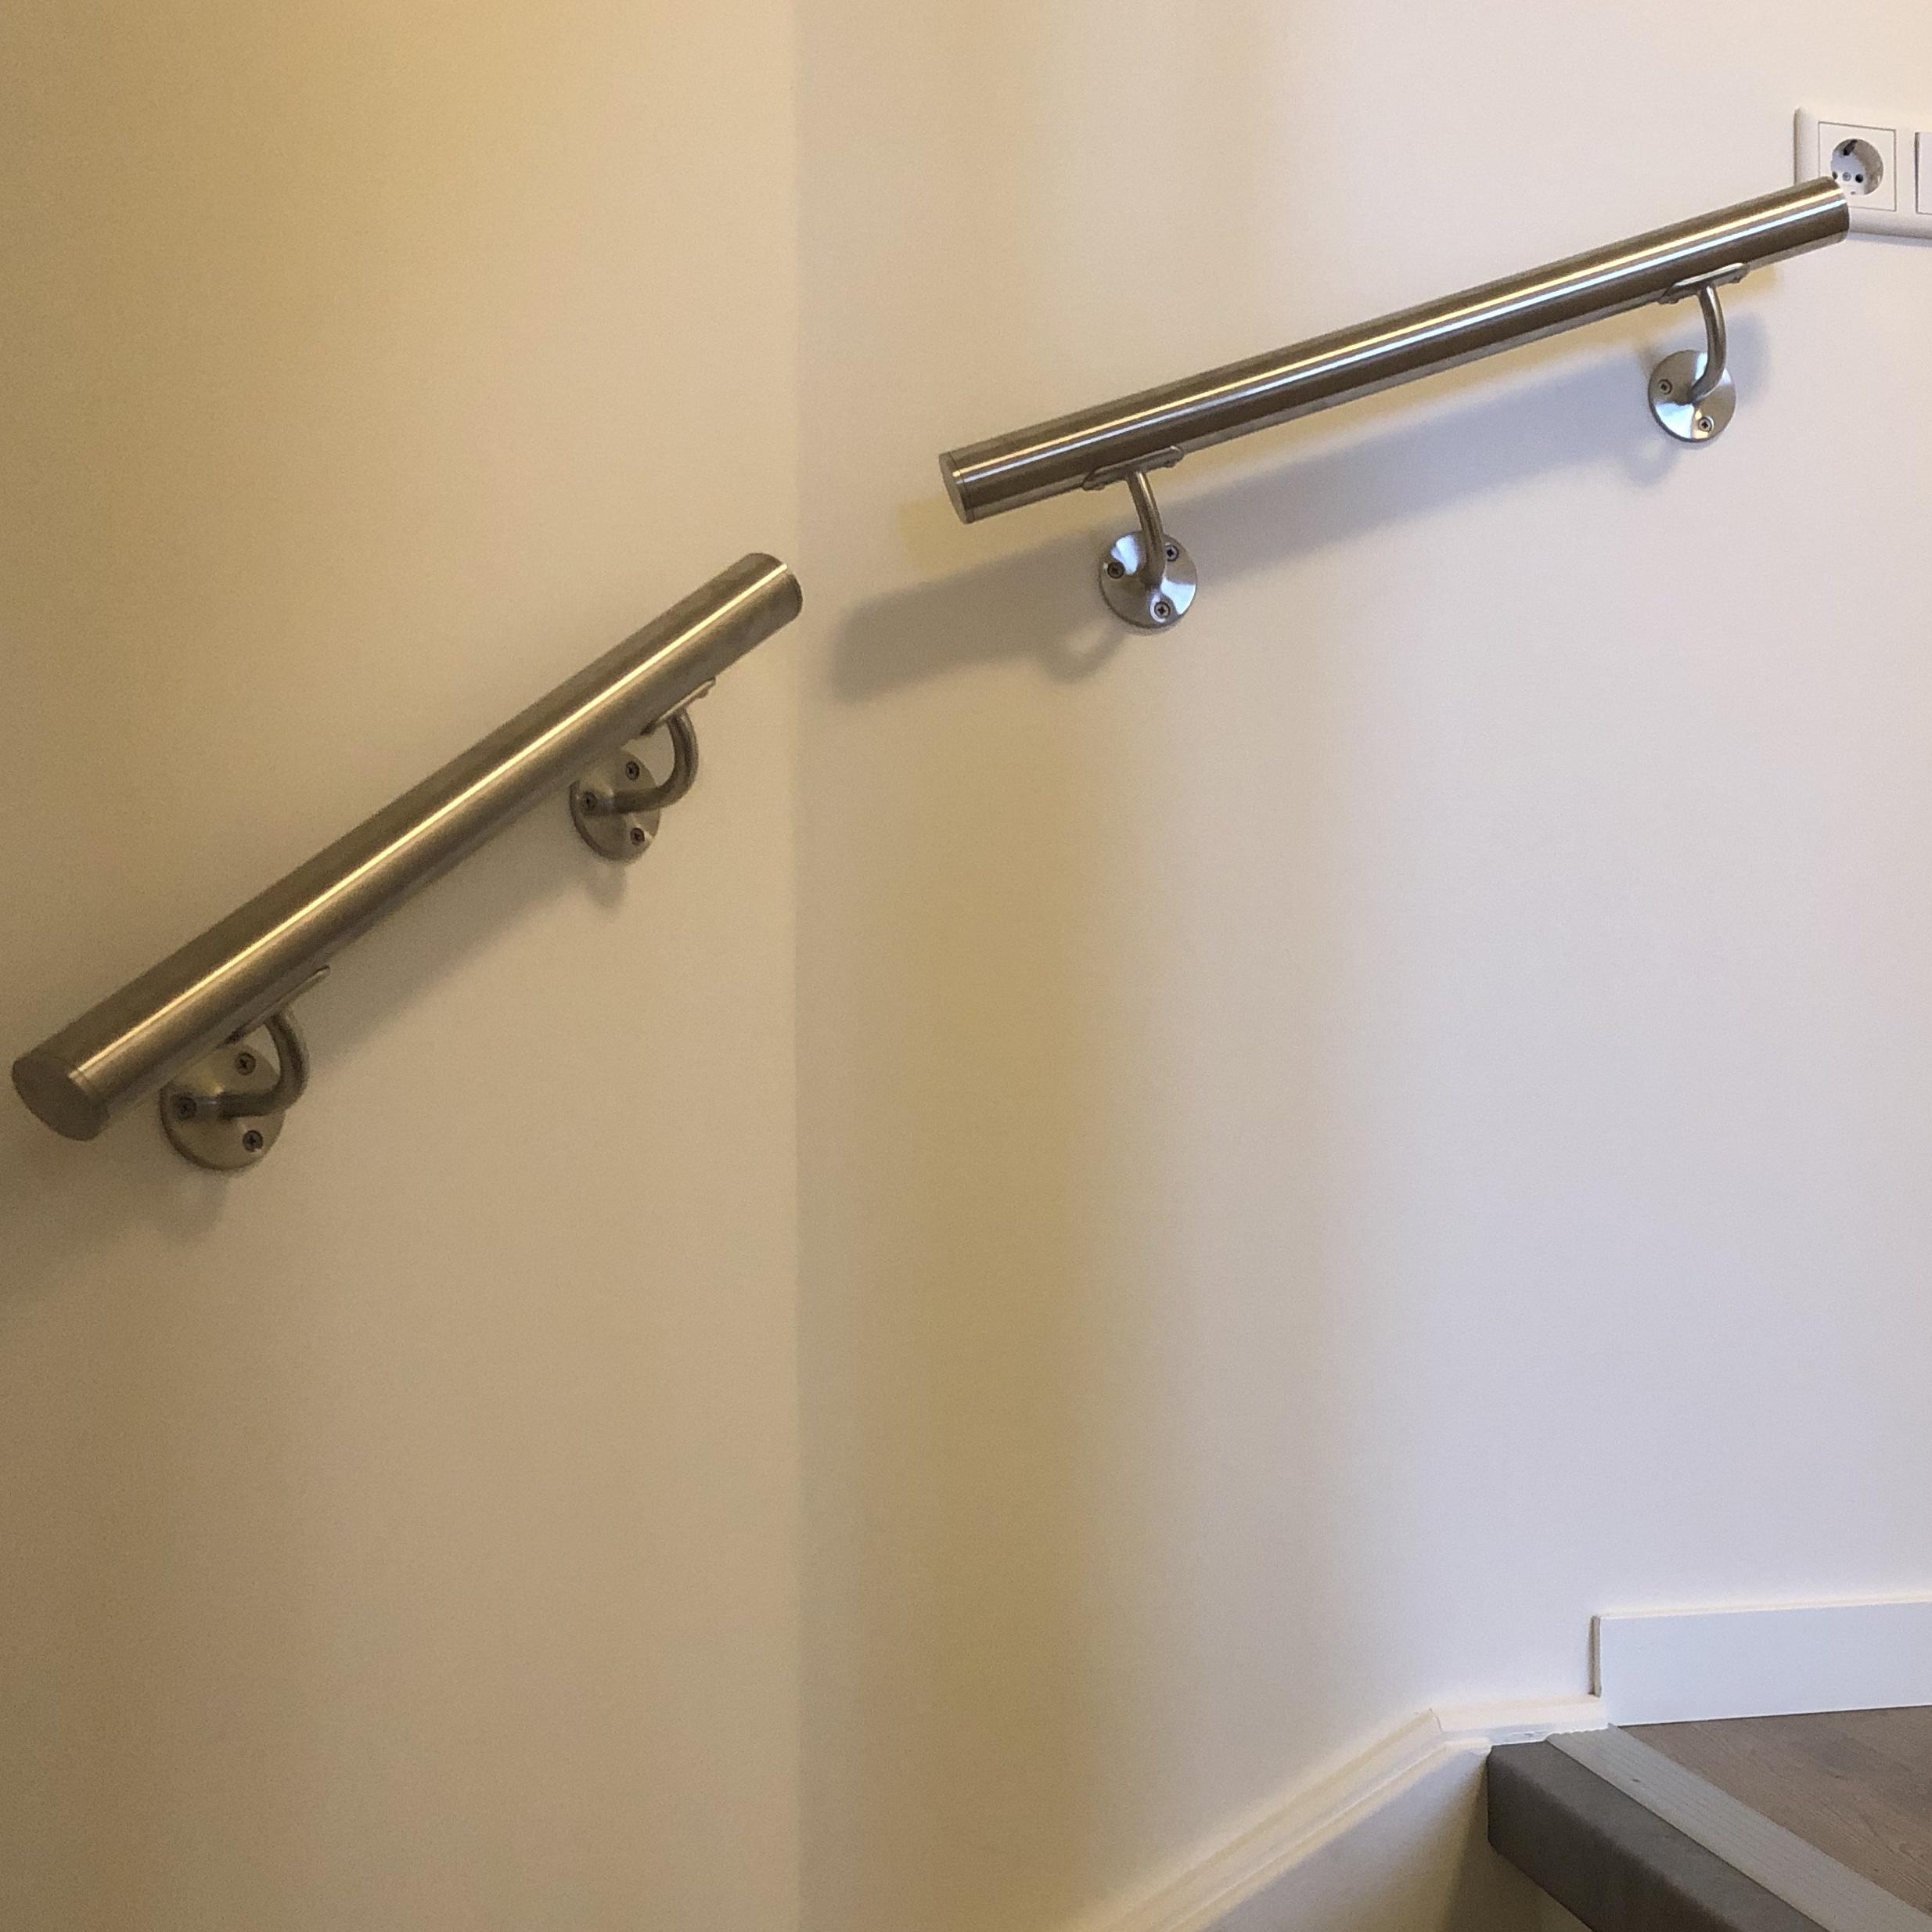 Handlauf Edelstahl rund gebürstet Modell 2 - Runde Edelstahl Treppengeländer - Treppenhandlauf